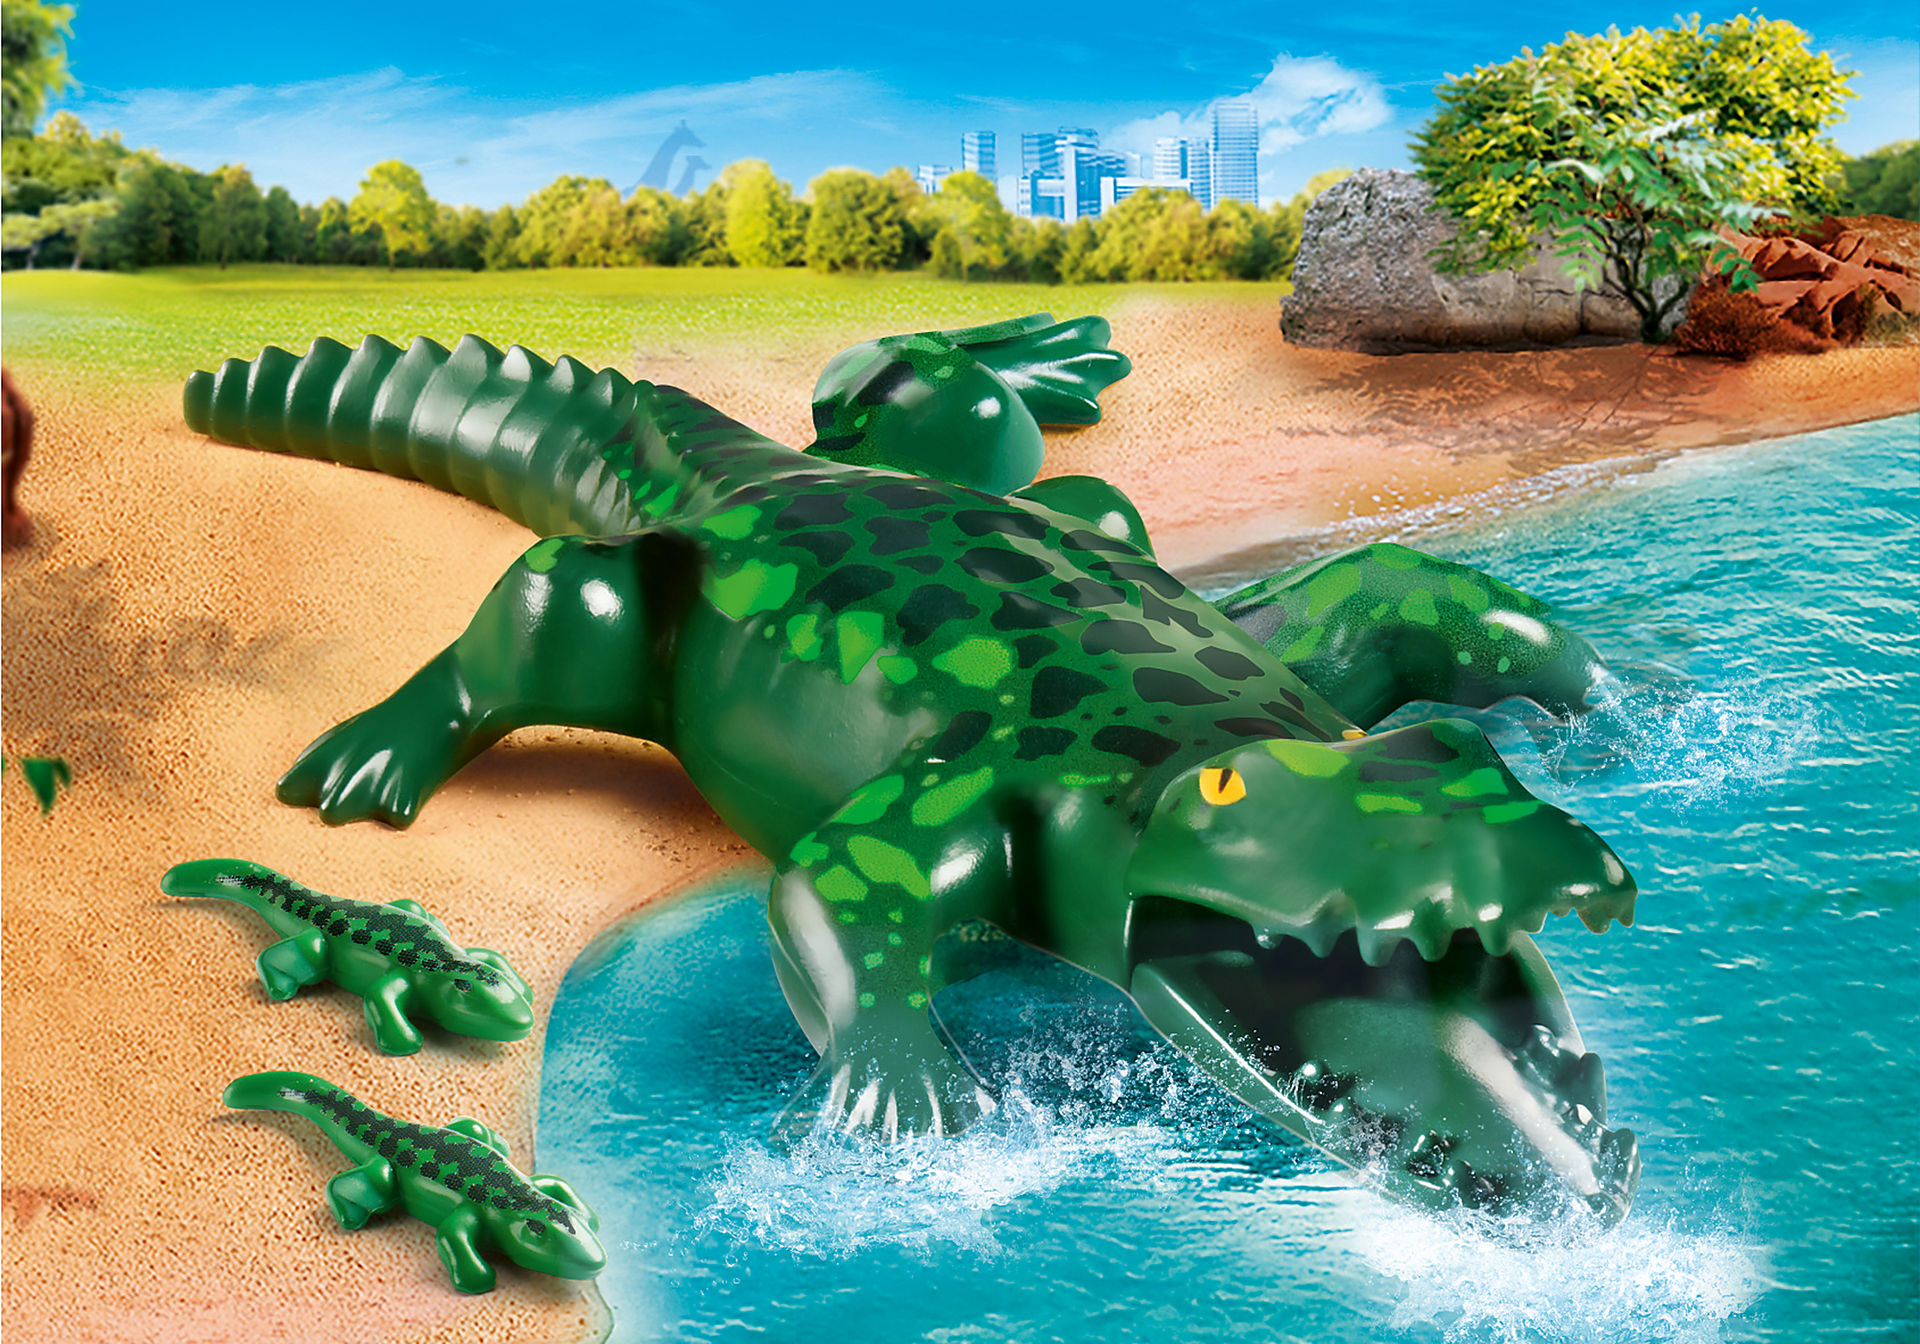 70358 Alligator with Babies zoom image1